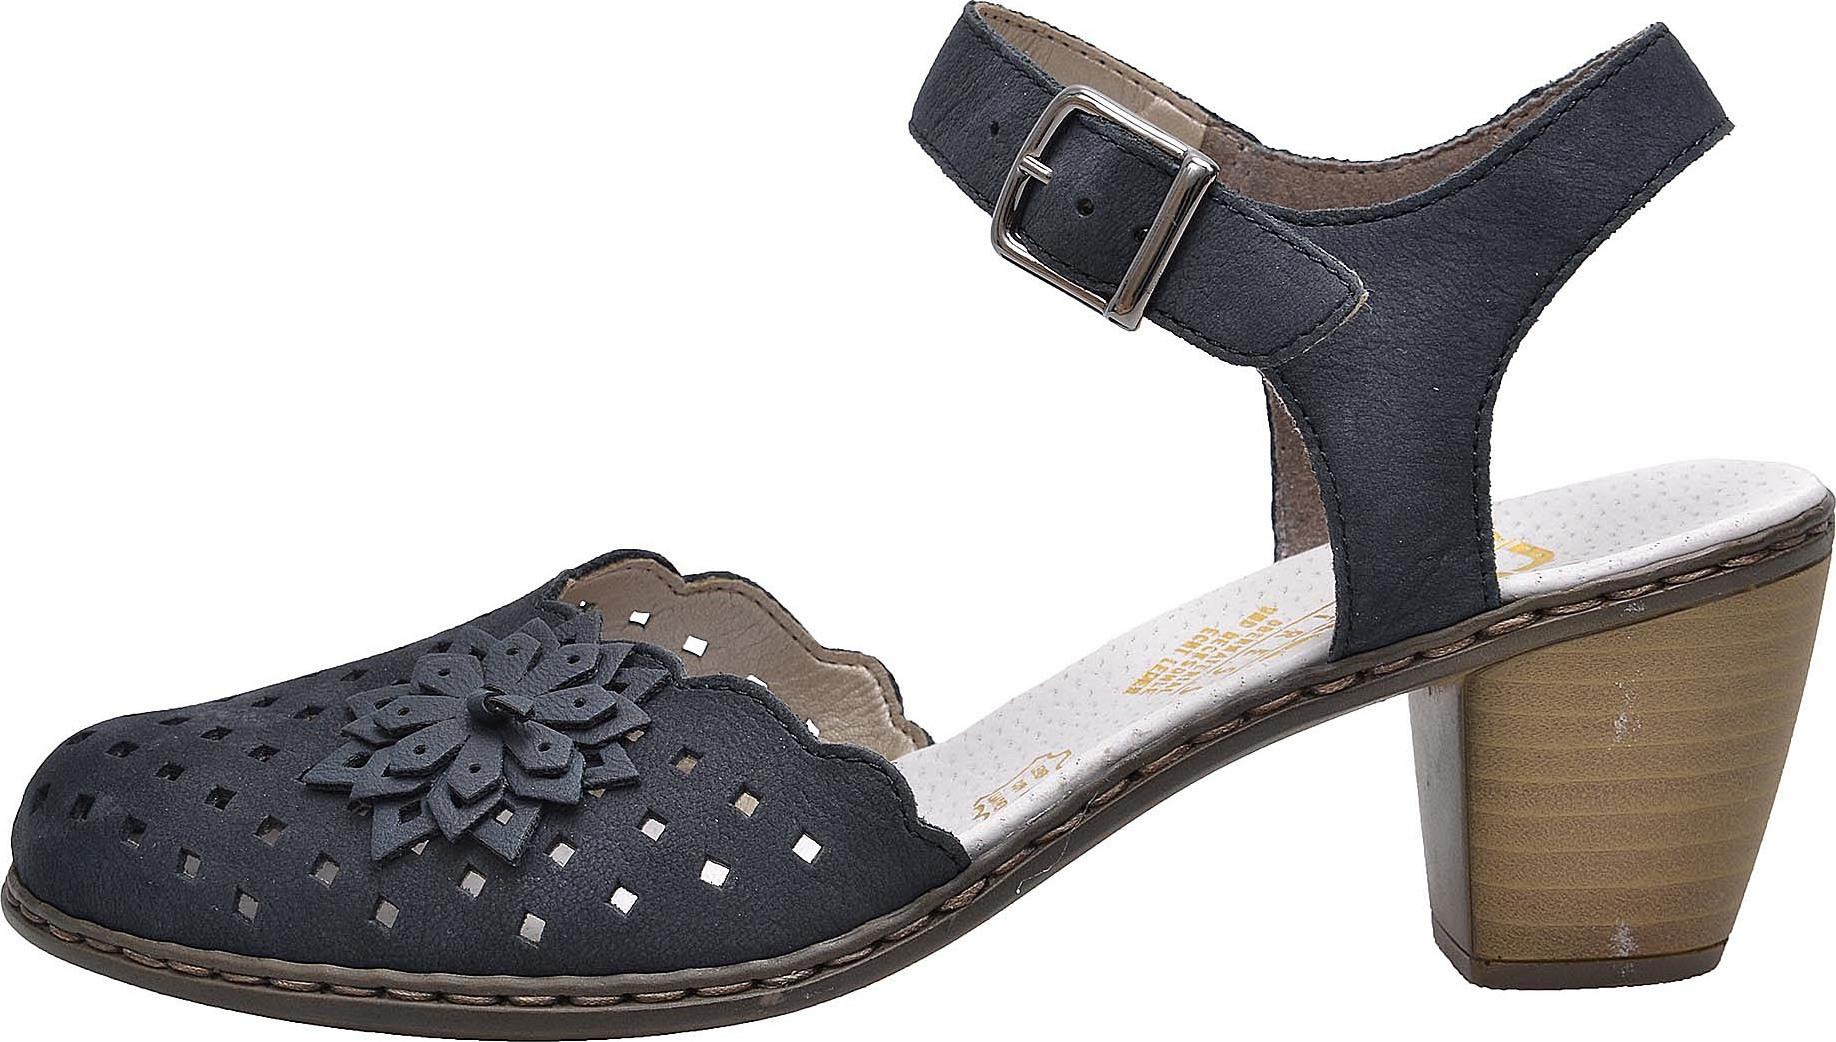 c1a732ed65 Dámská obuv RIEKER 40956 14 BLAU F S 8 – Rieker Antistress